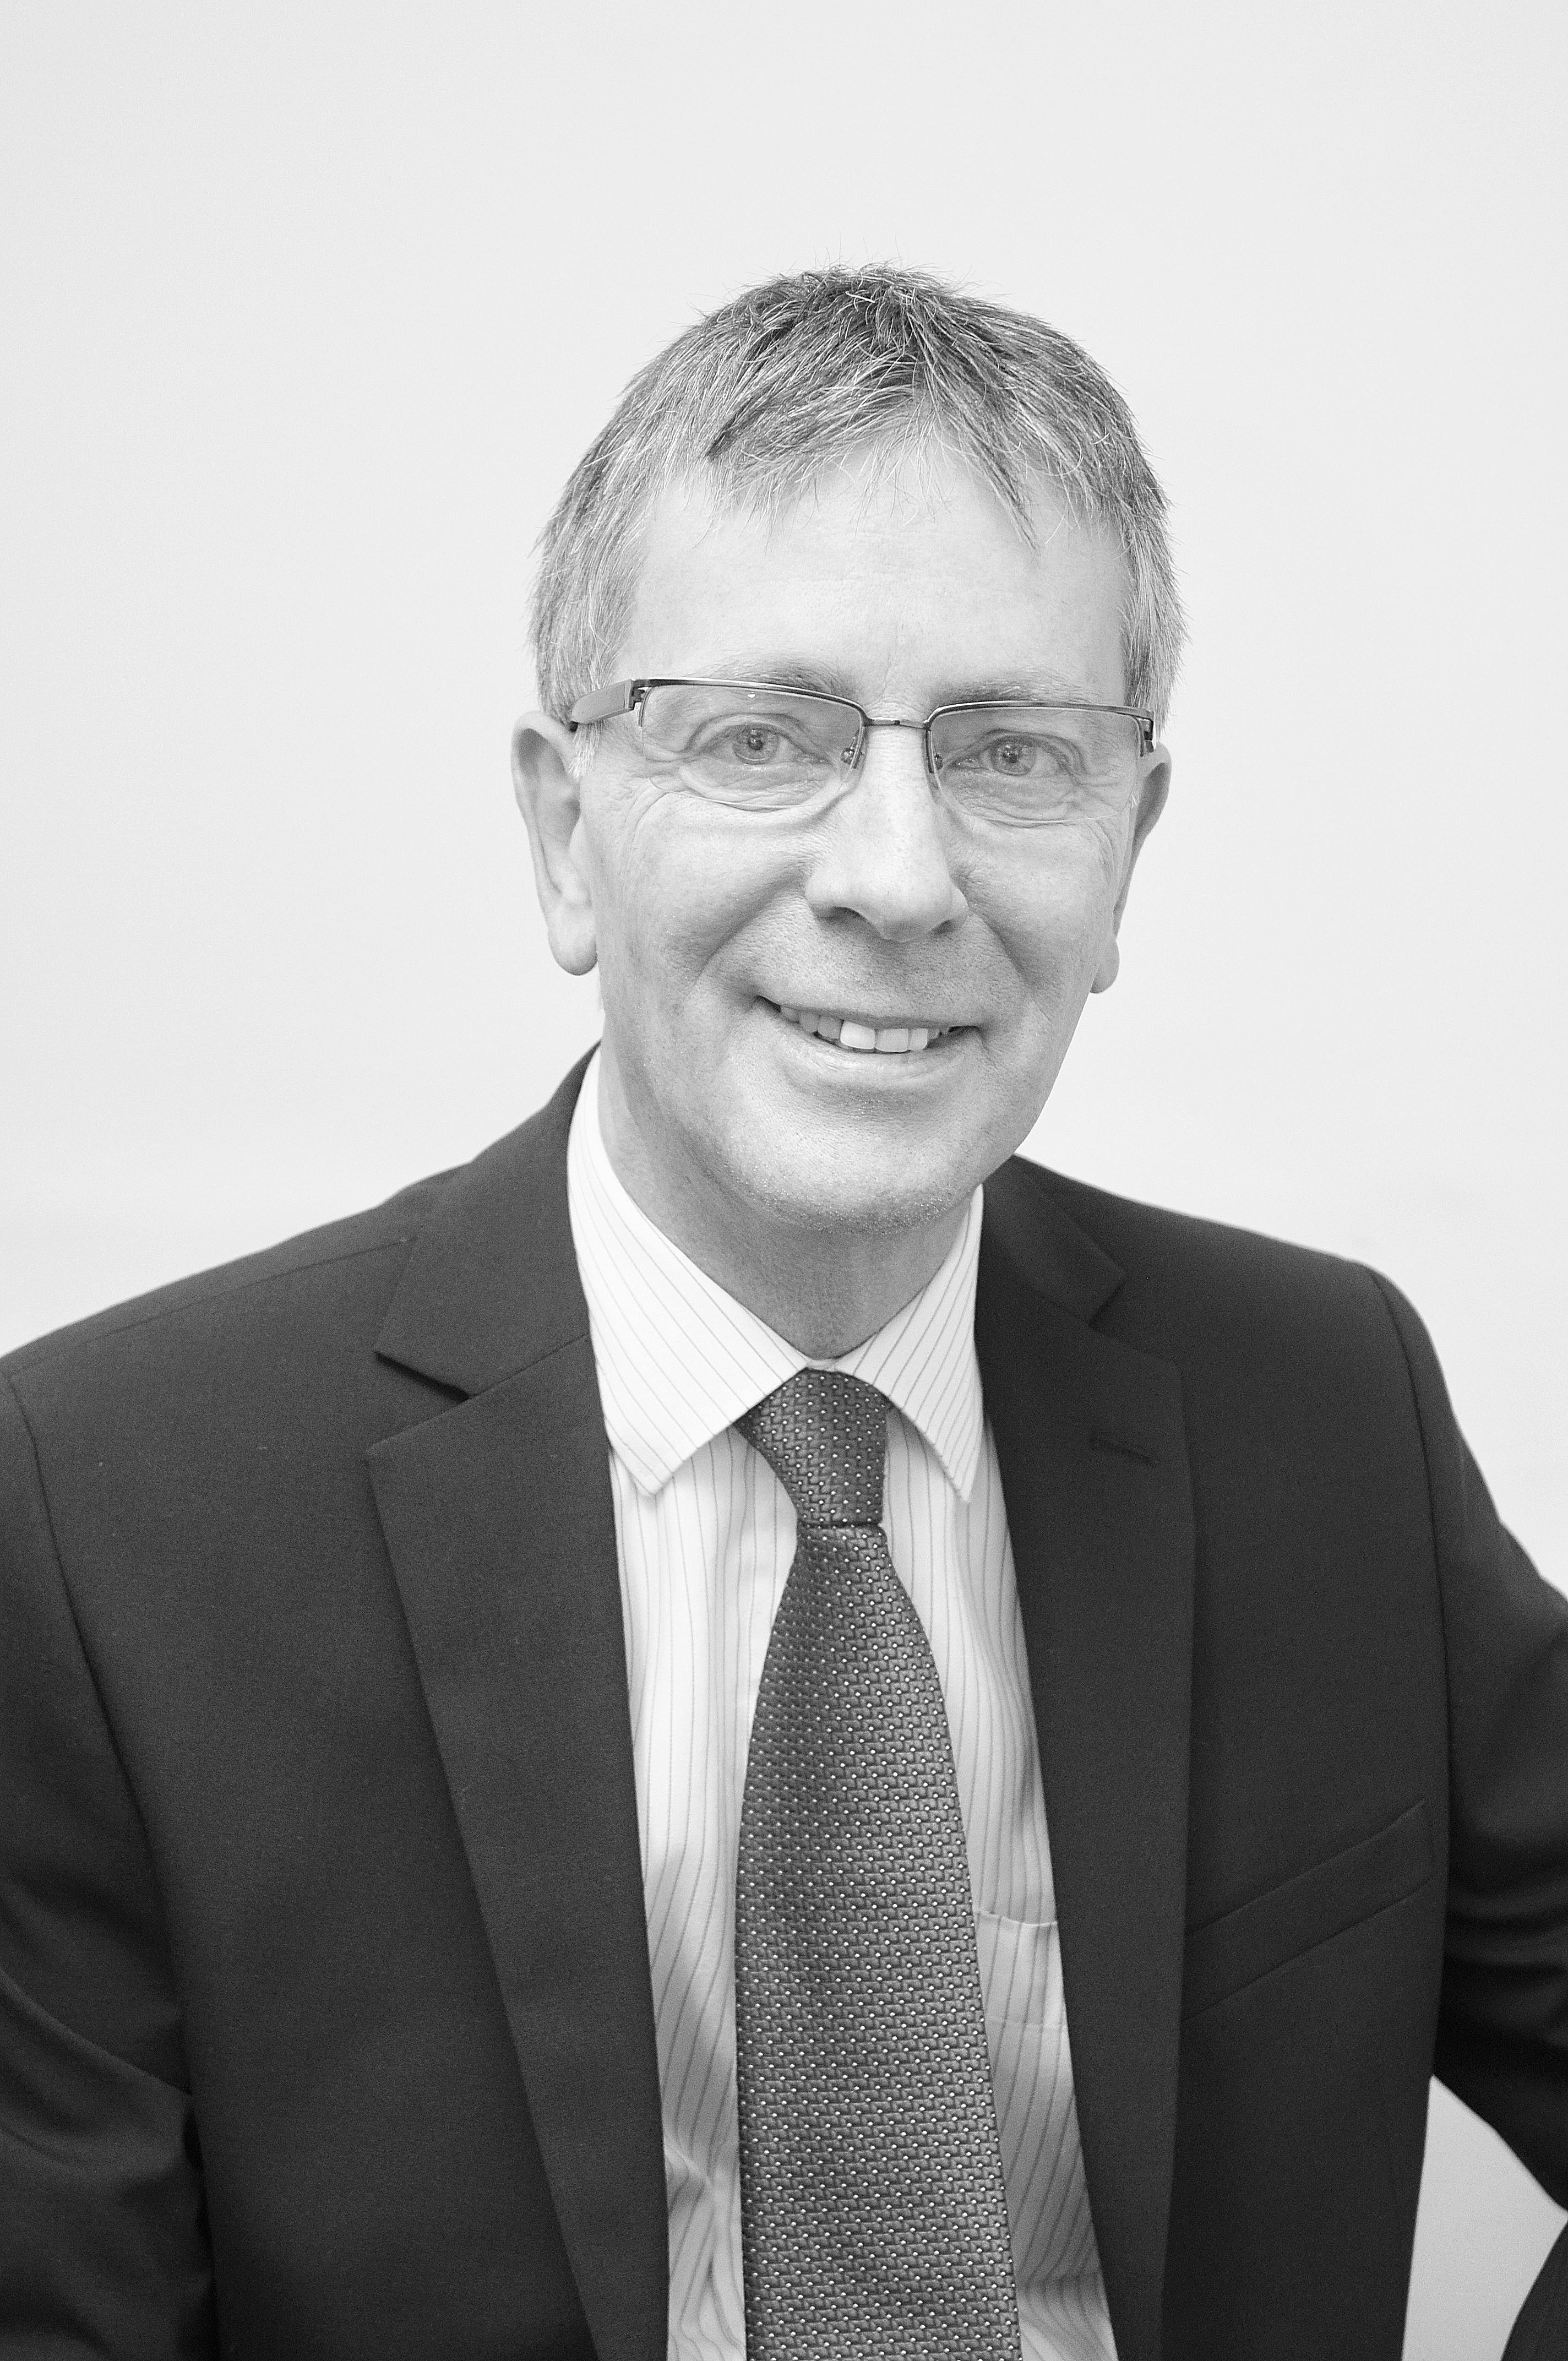 Christopher Tinney